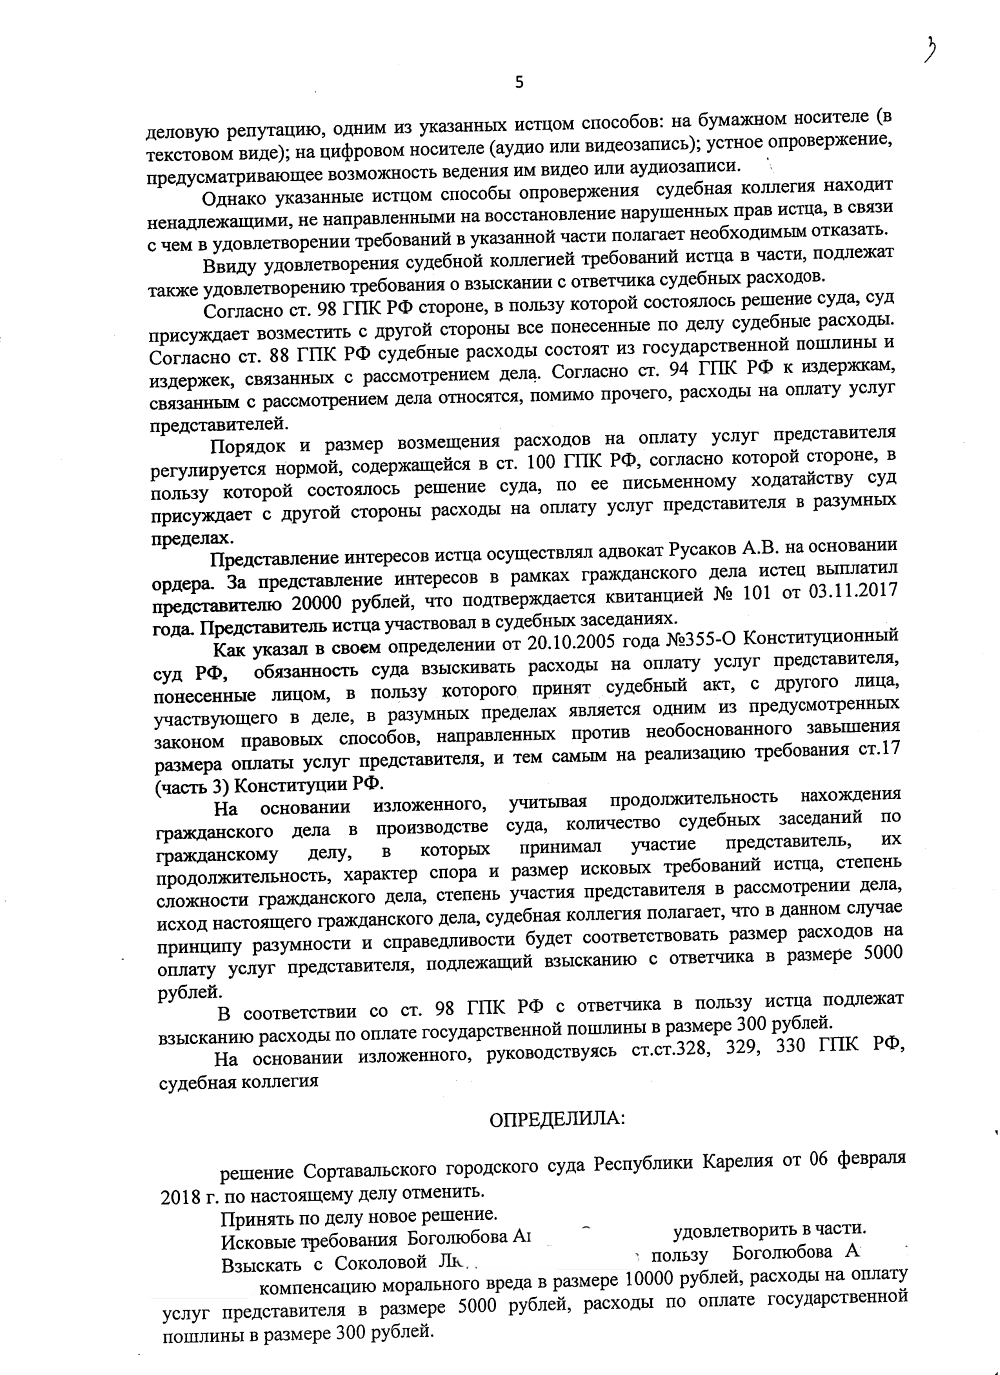 https://sontgranit.ru/forum/img/sokol/20180406-определениеВС-5.png